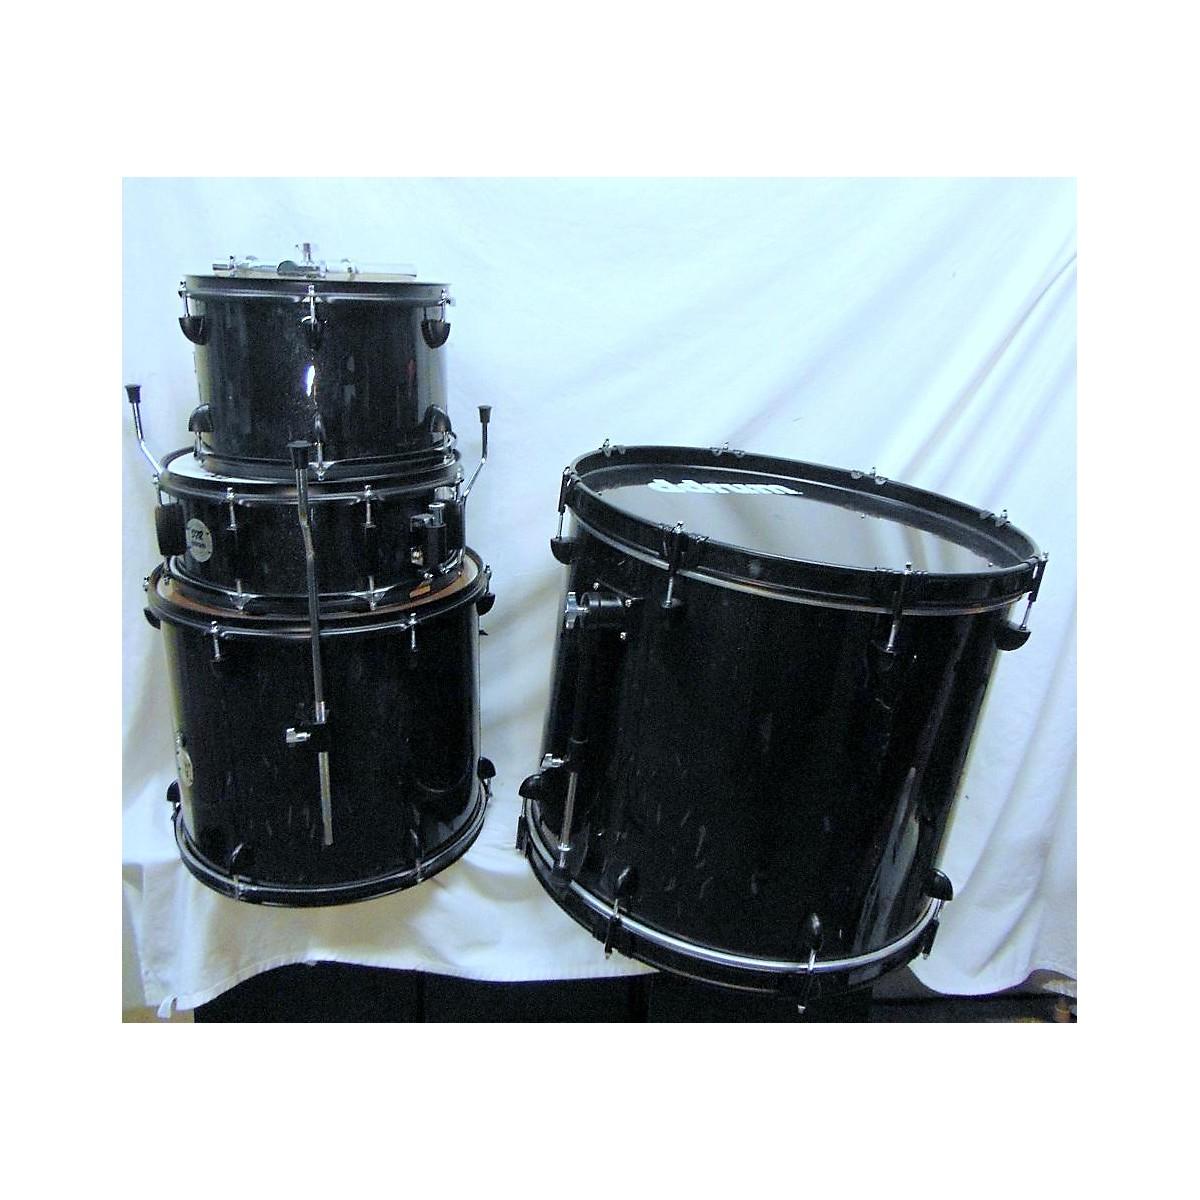 ddrum D2R Drum Kit